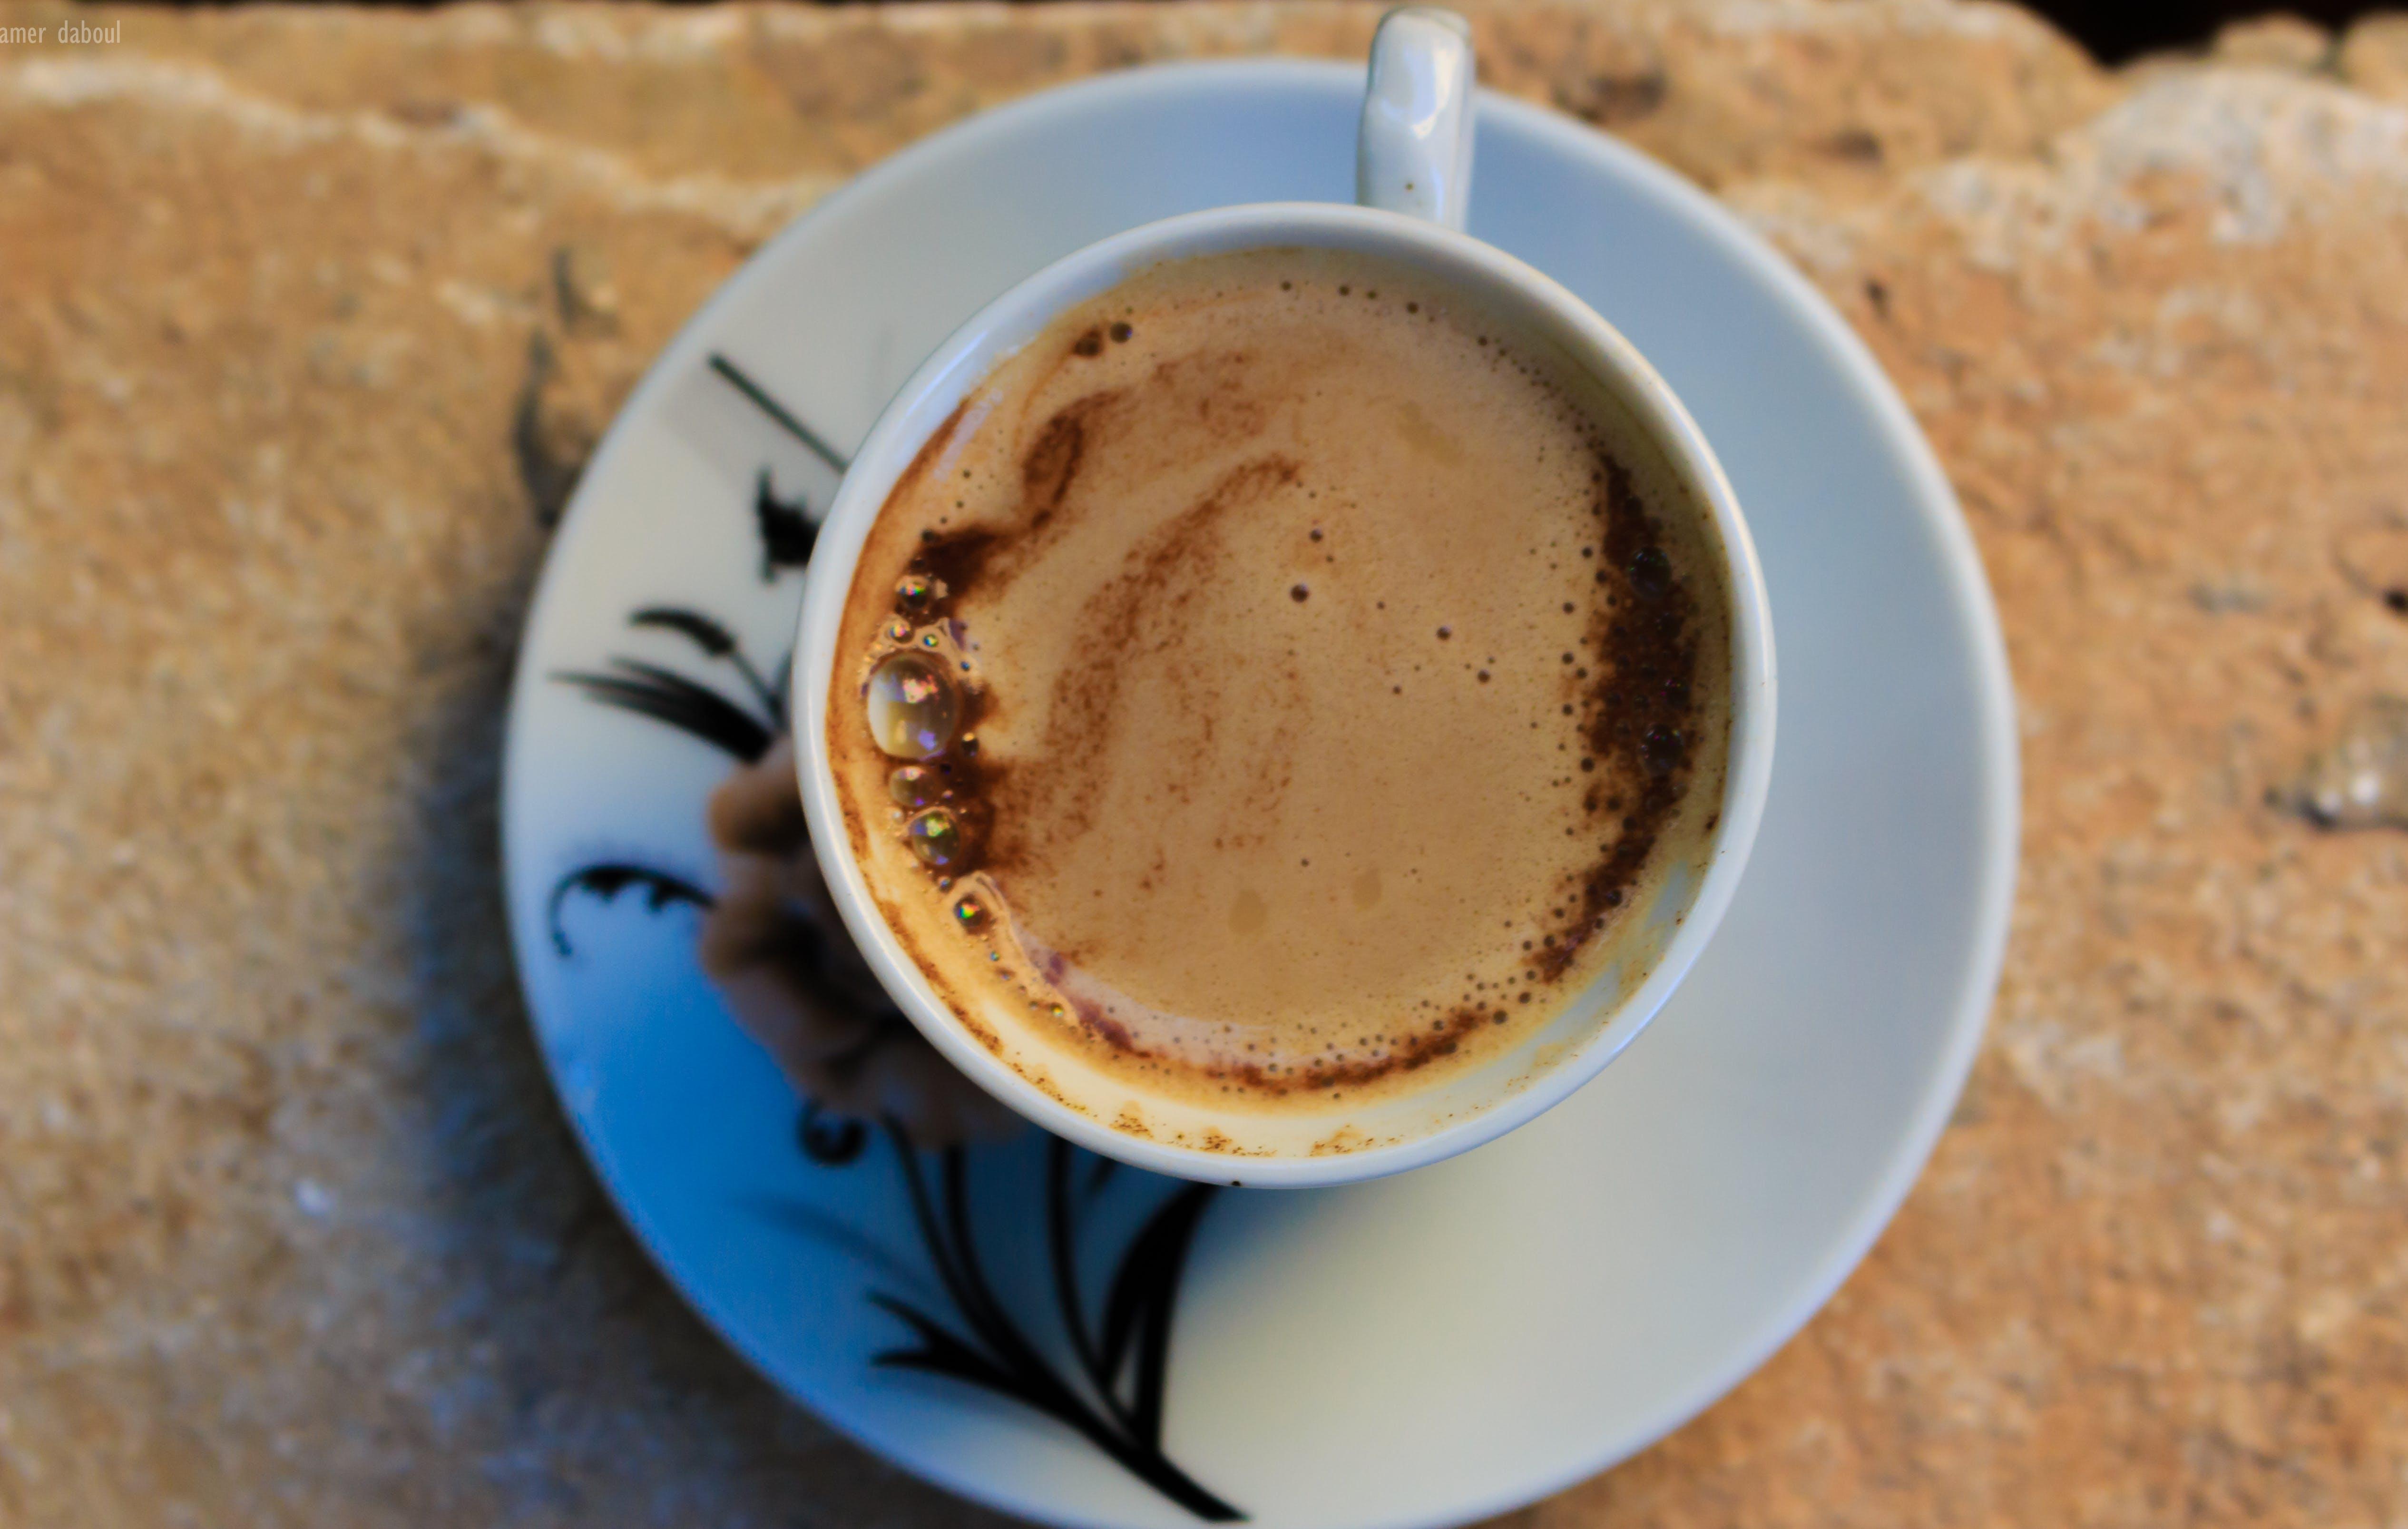 White Ceramic Mug With Coffee and White Ceramic Saucer